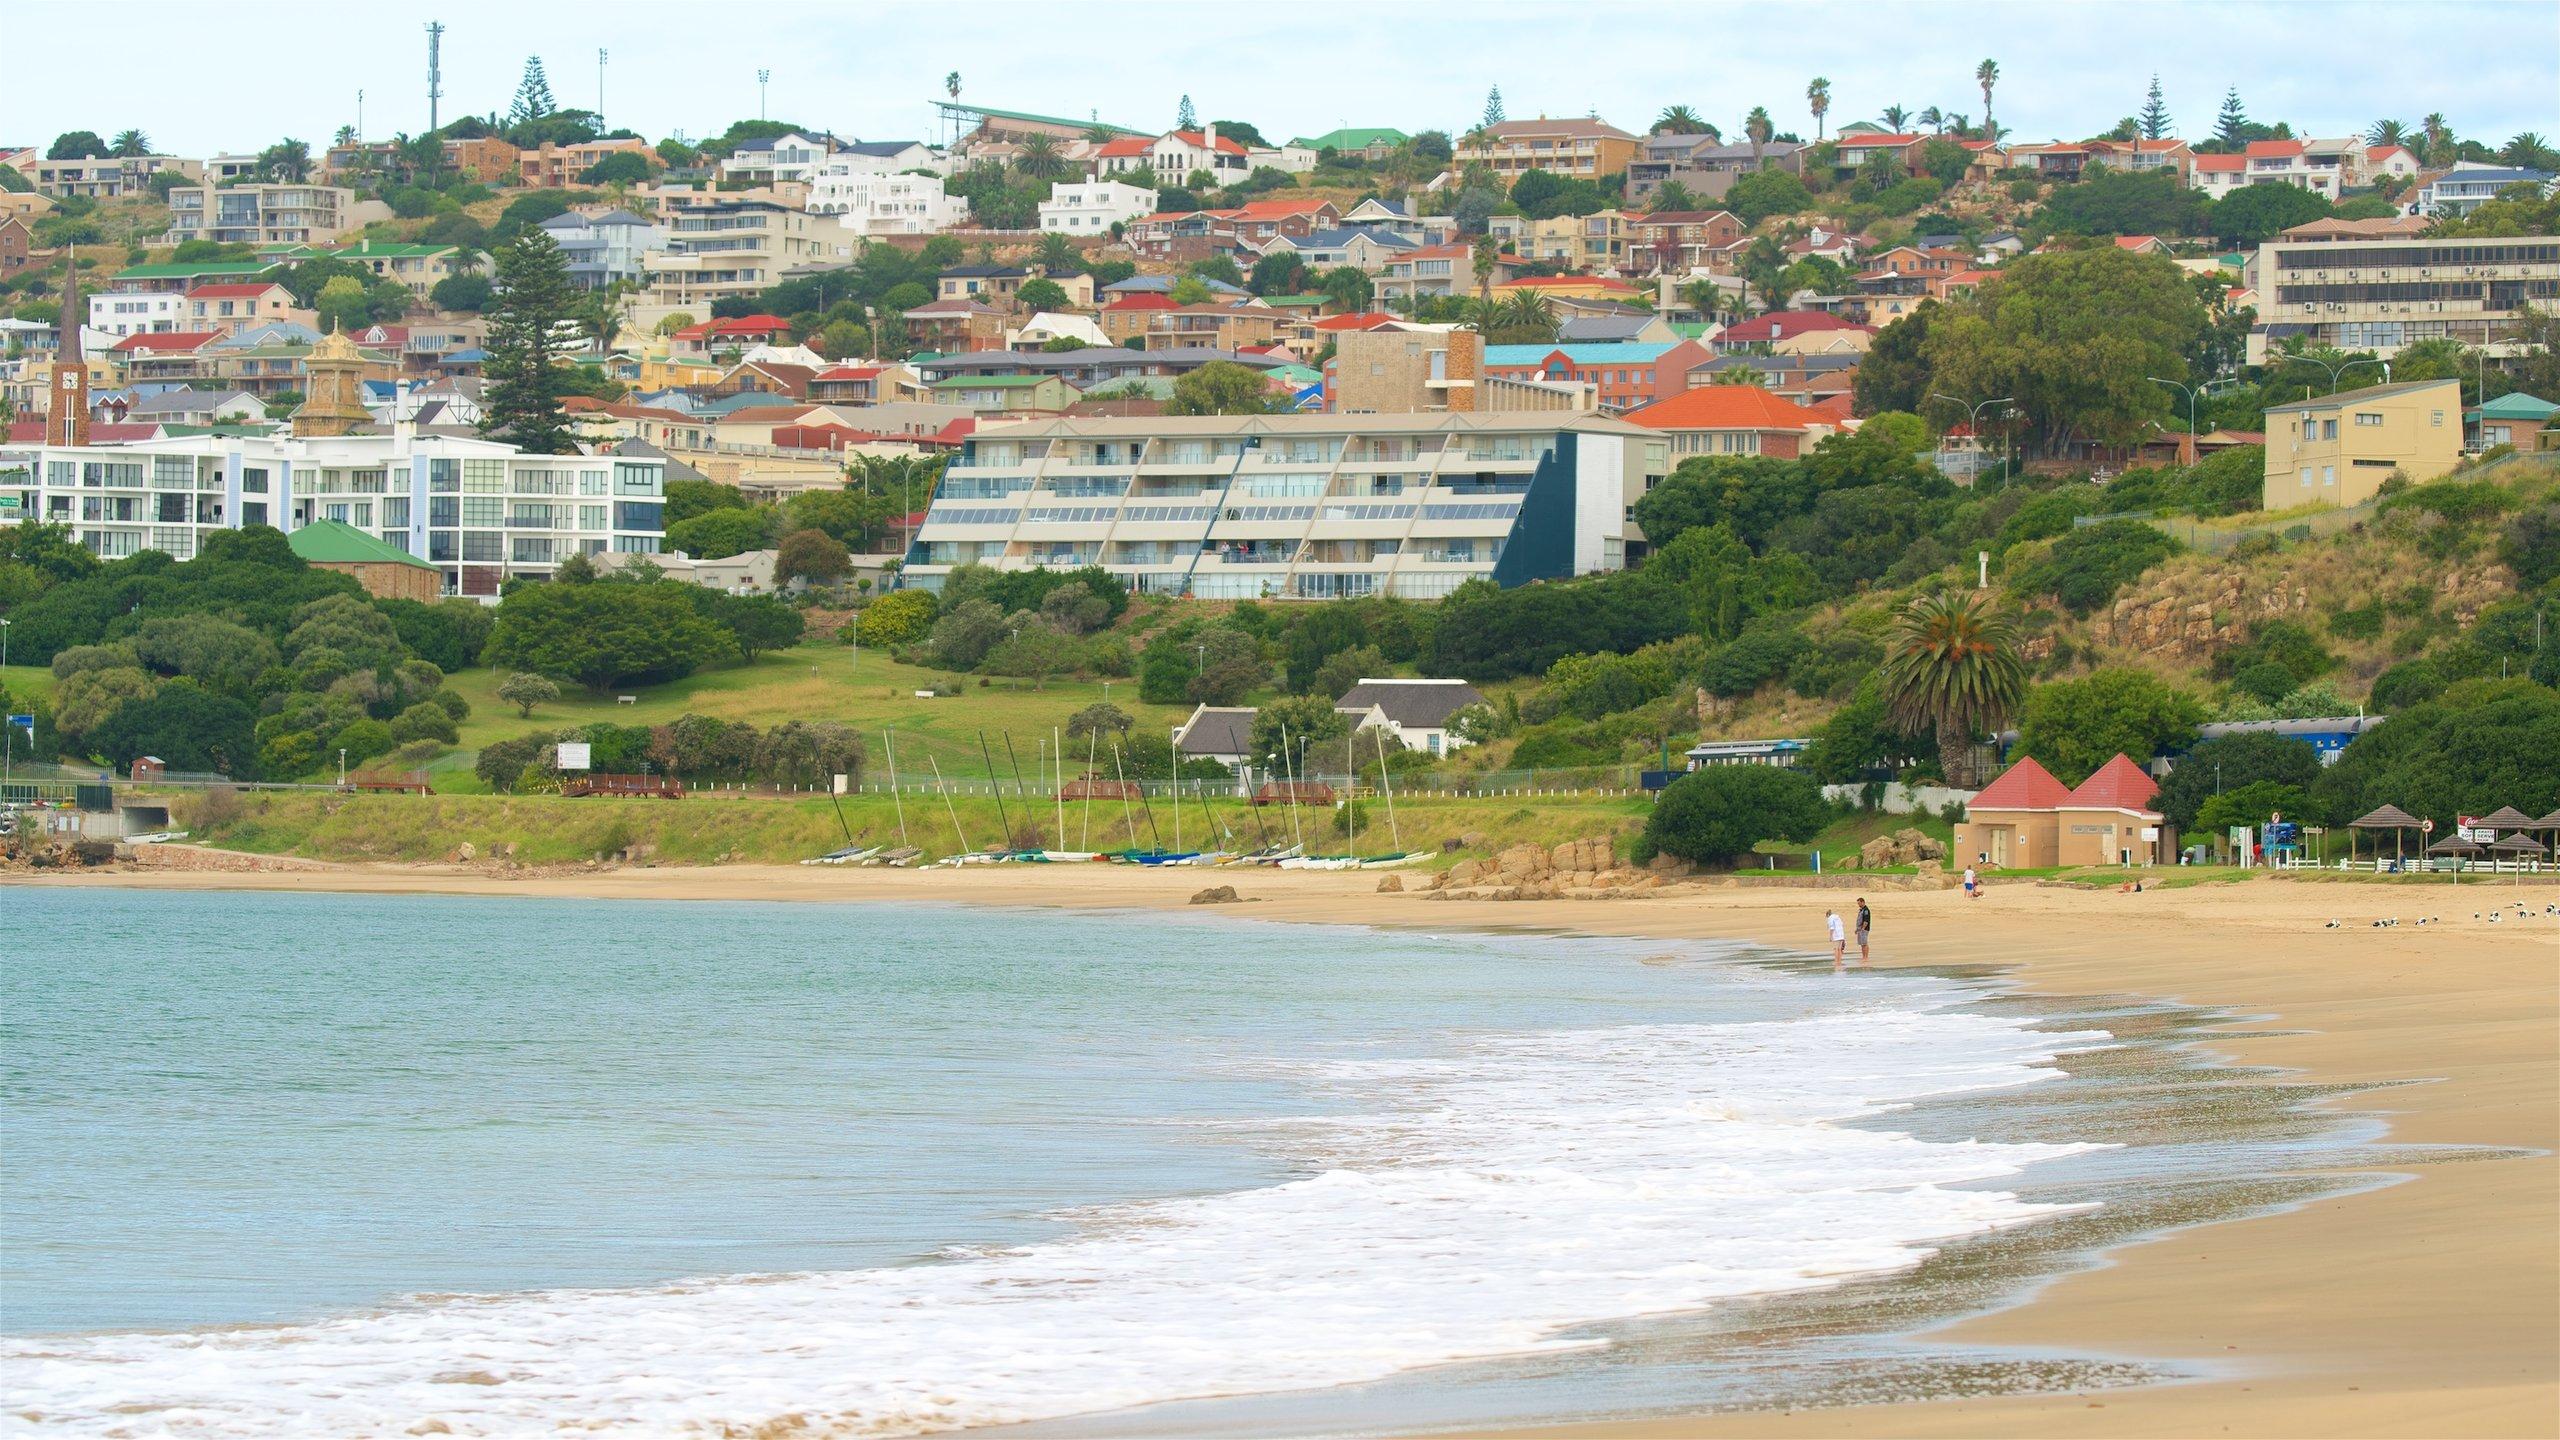 Mossel Bay, Western Cape (provins), Sydafrika